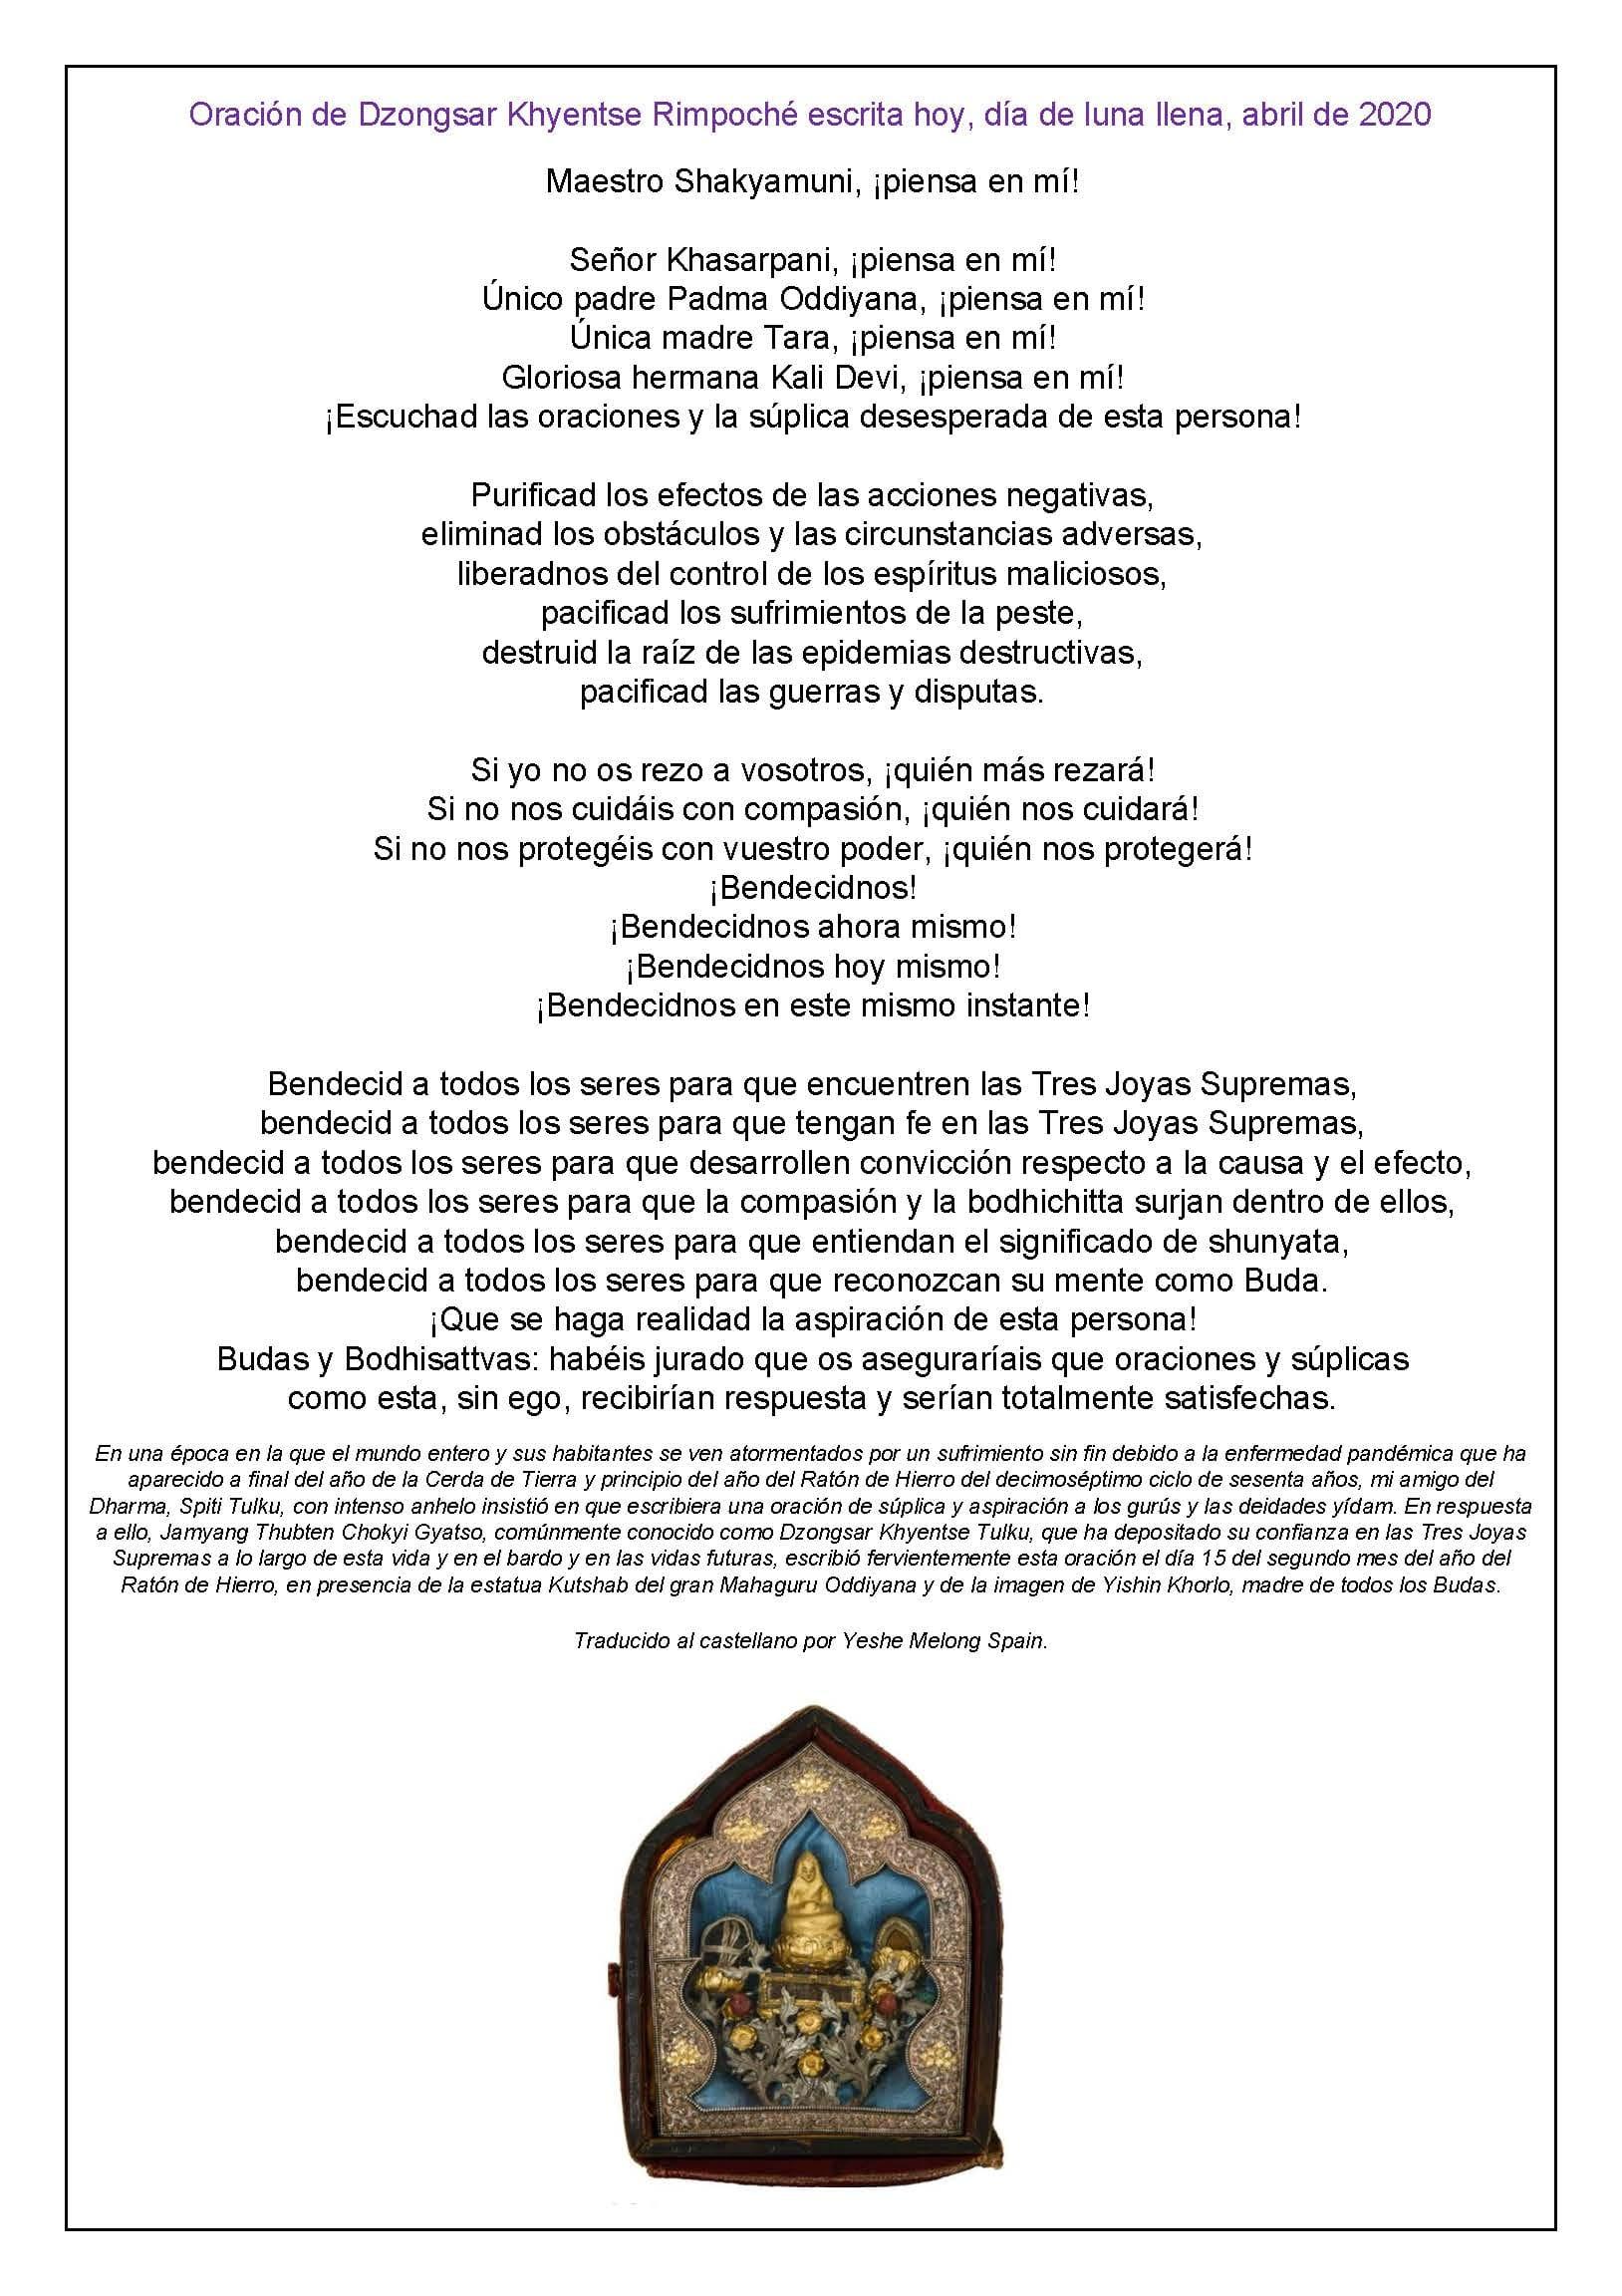 Oracion pandemia Dzongsar Khyentse Rimpoche